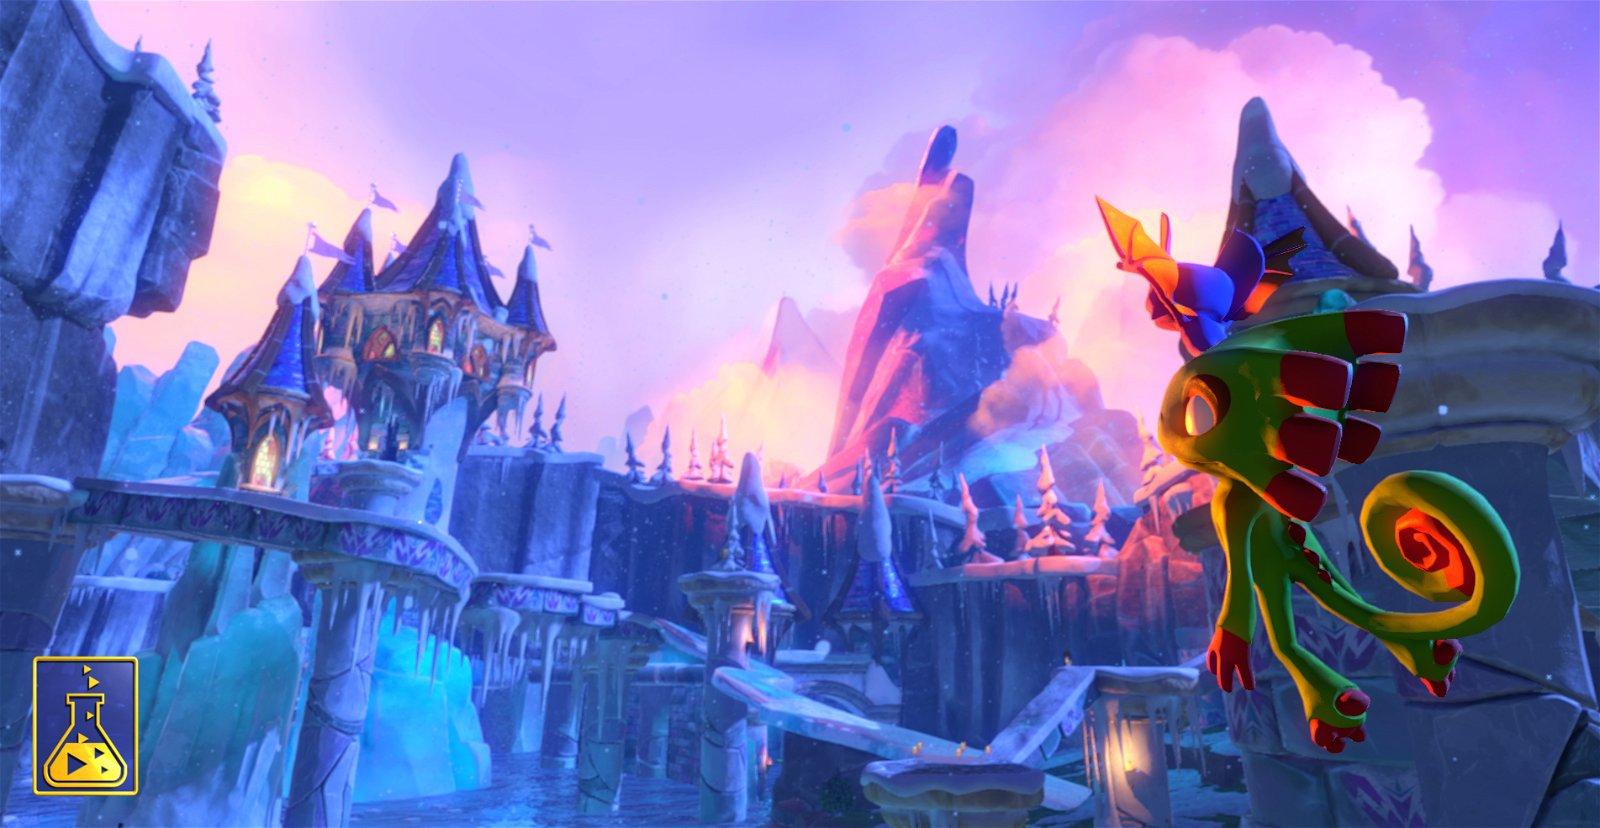 Playtonic Games Releases New Yooka-Laylee Screenshots, Info 2